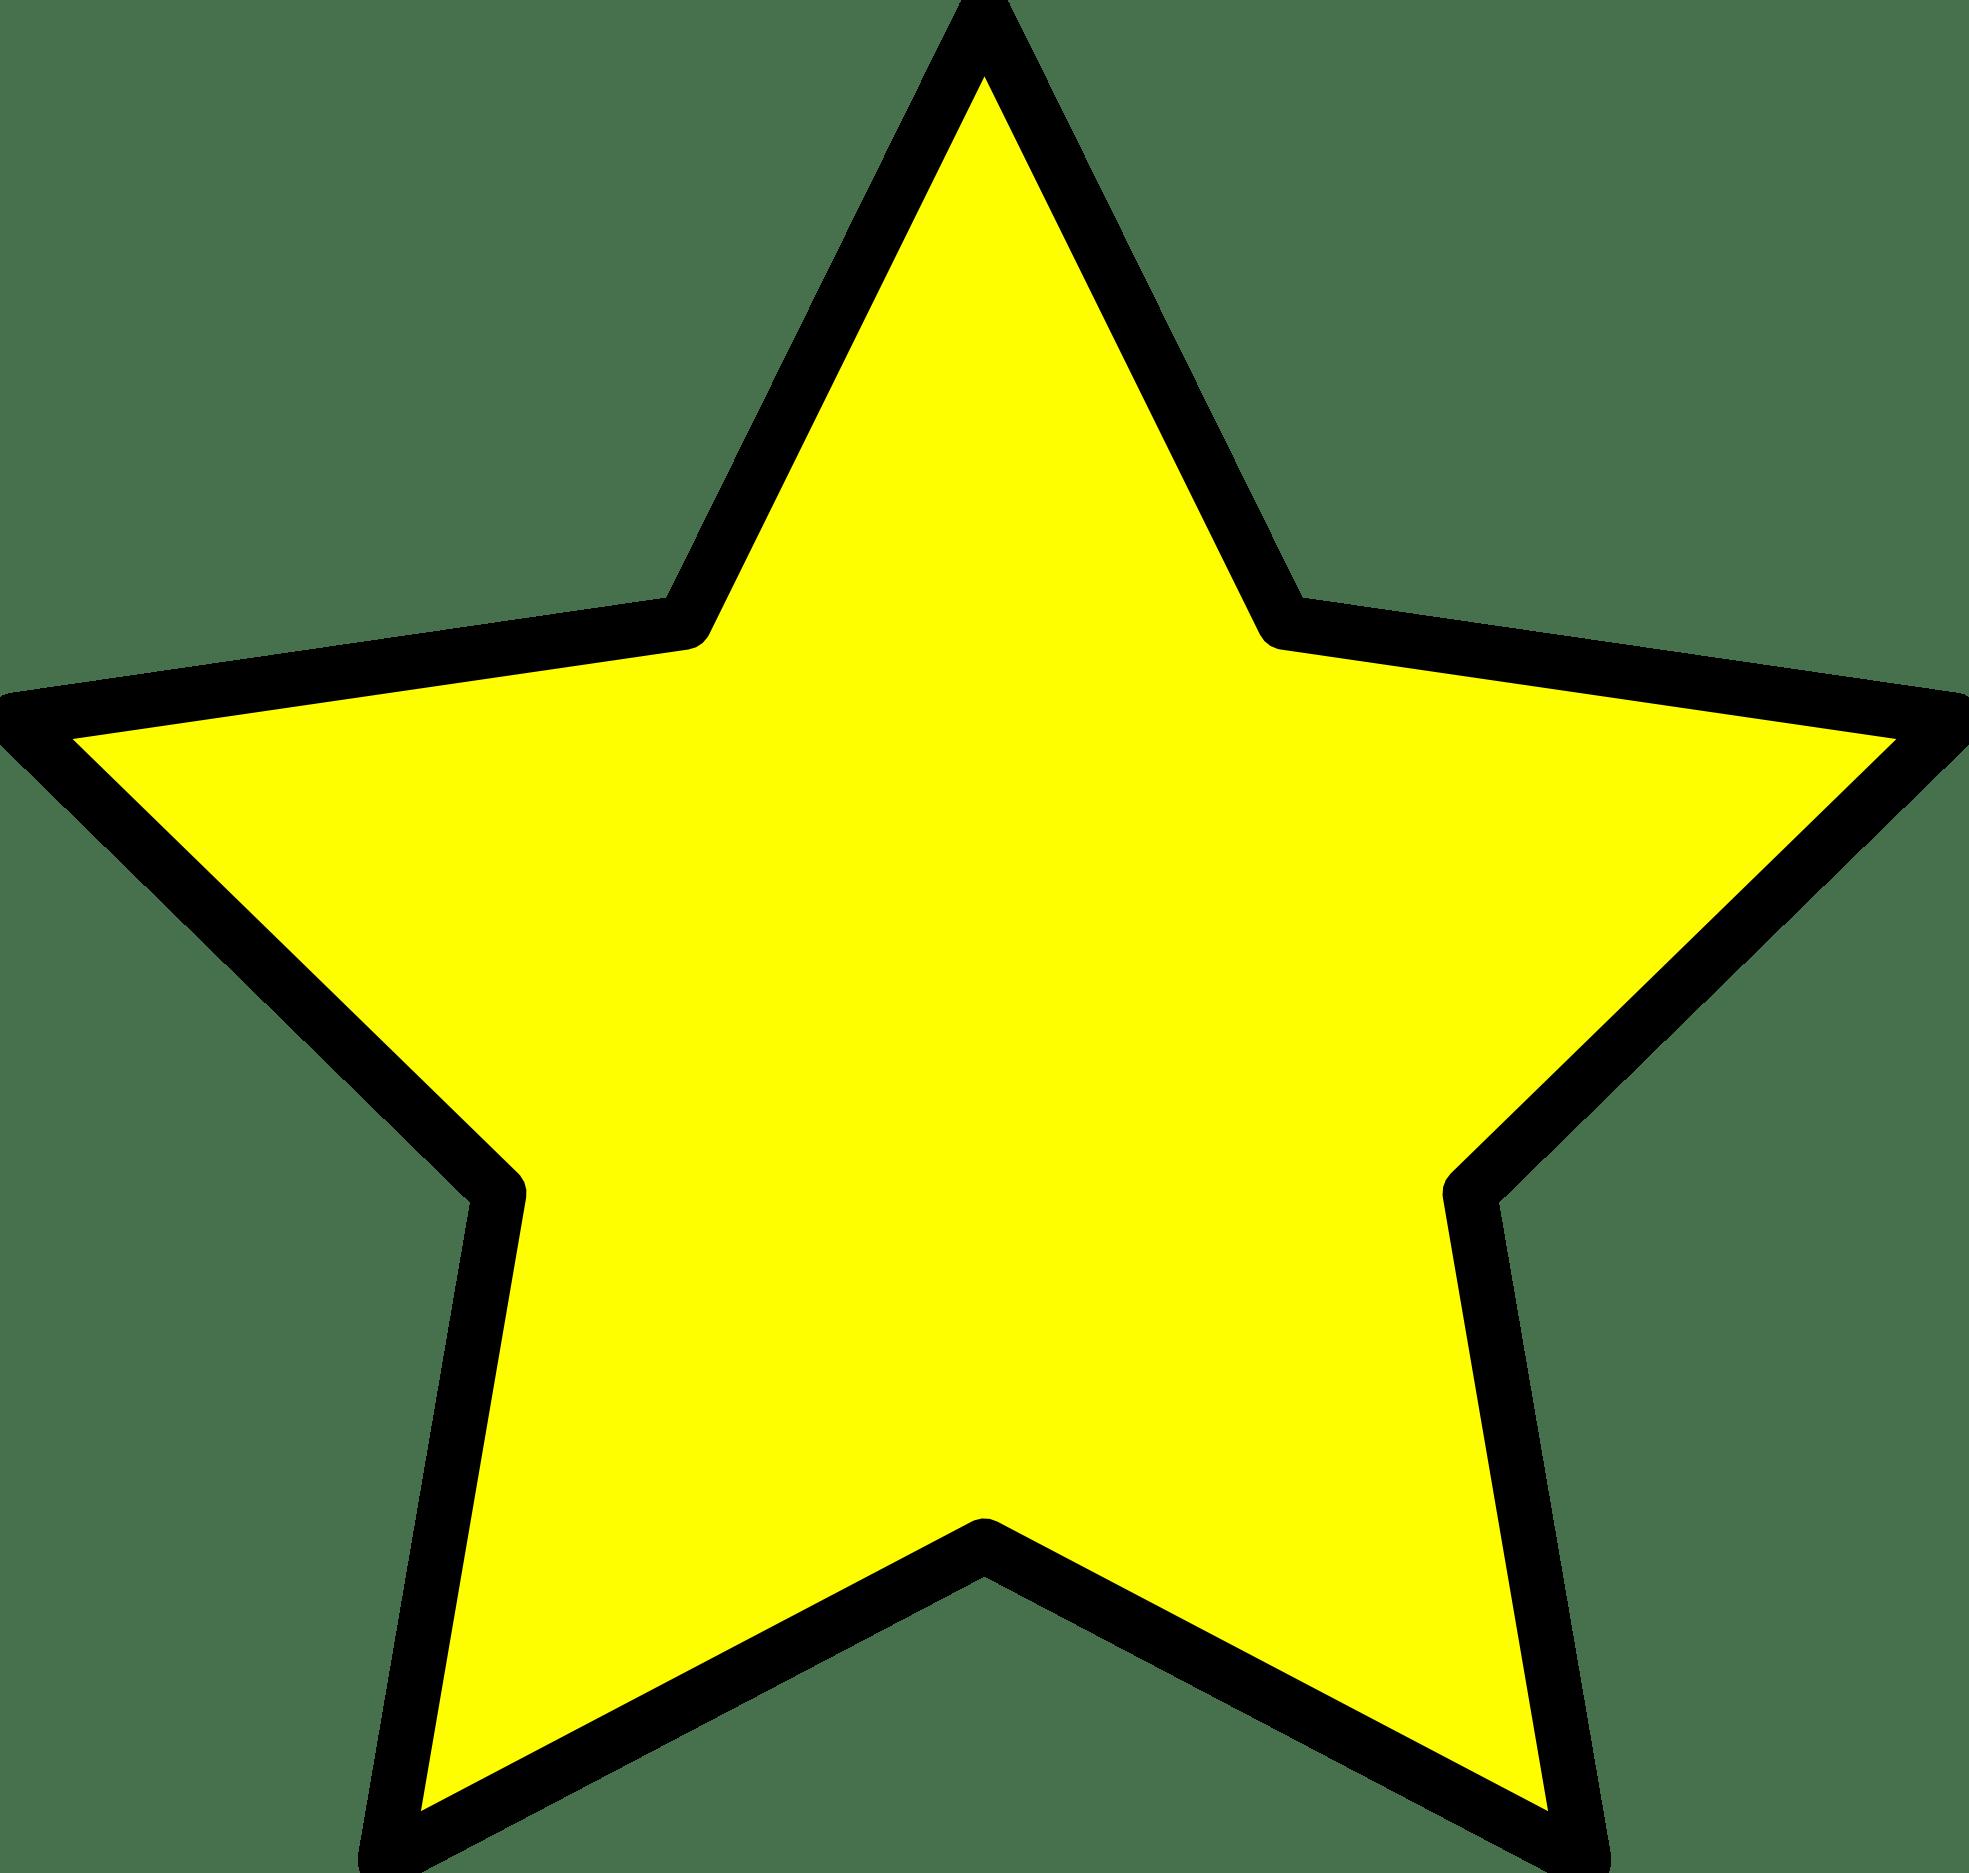 Star Trophy Clipart | Clipart Panda - Free Clipart Images (1969 x 1873 Pixel)